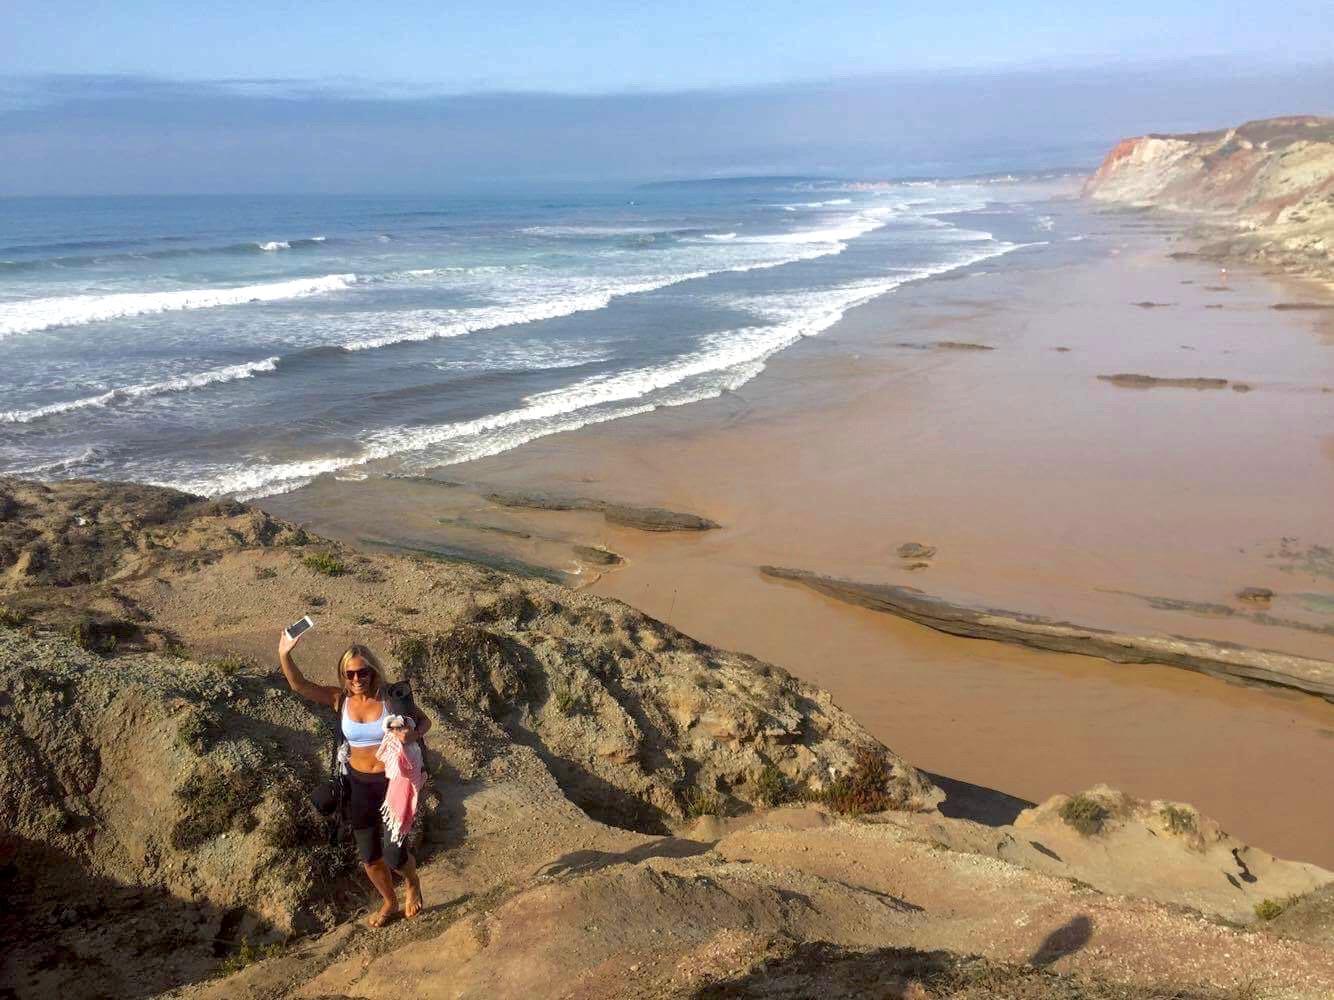 surfa i portugal sommar